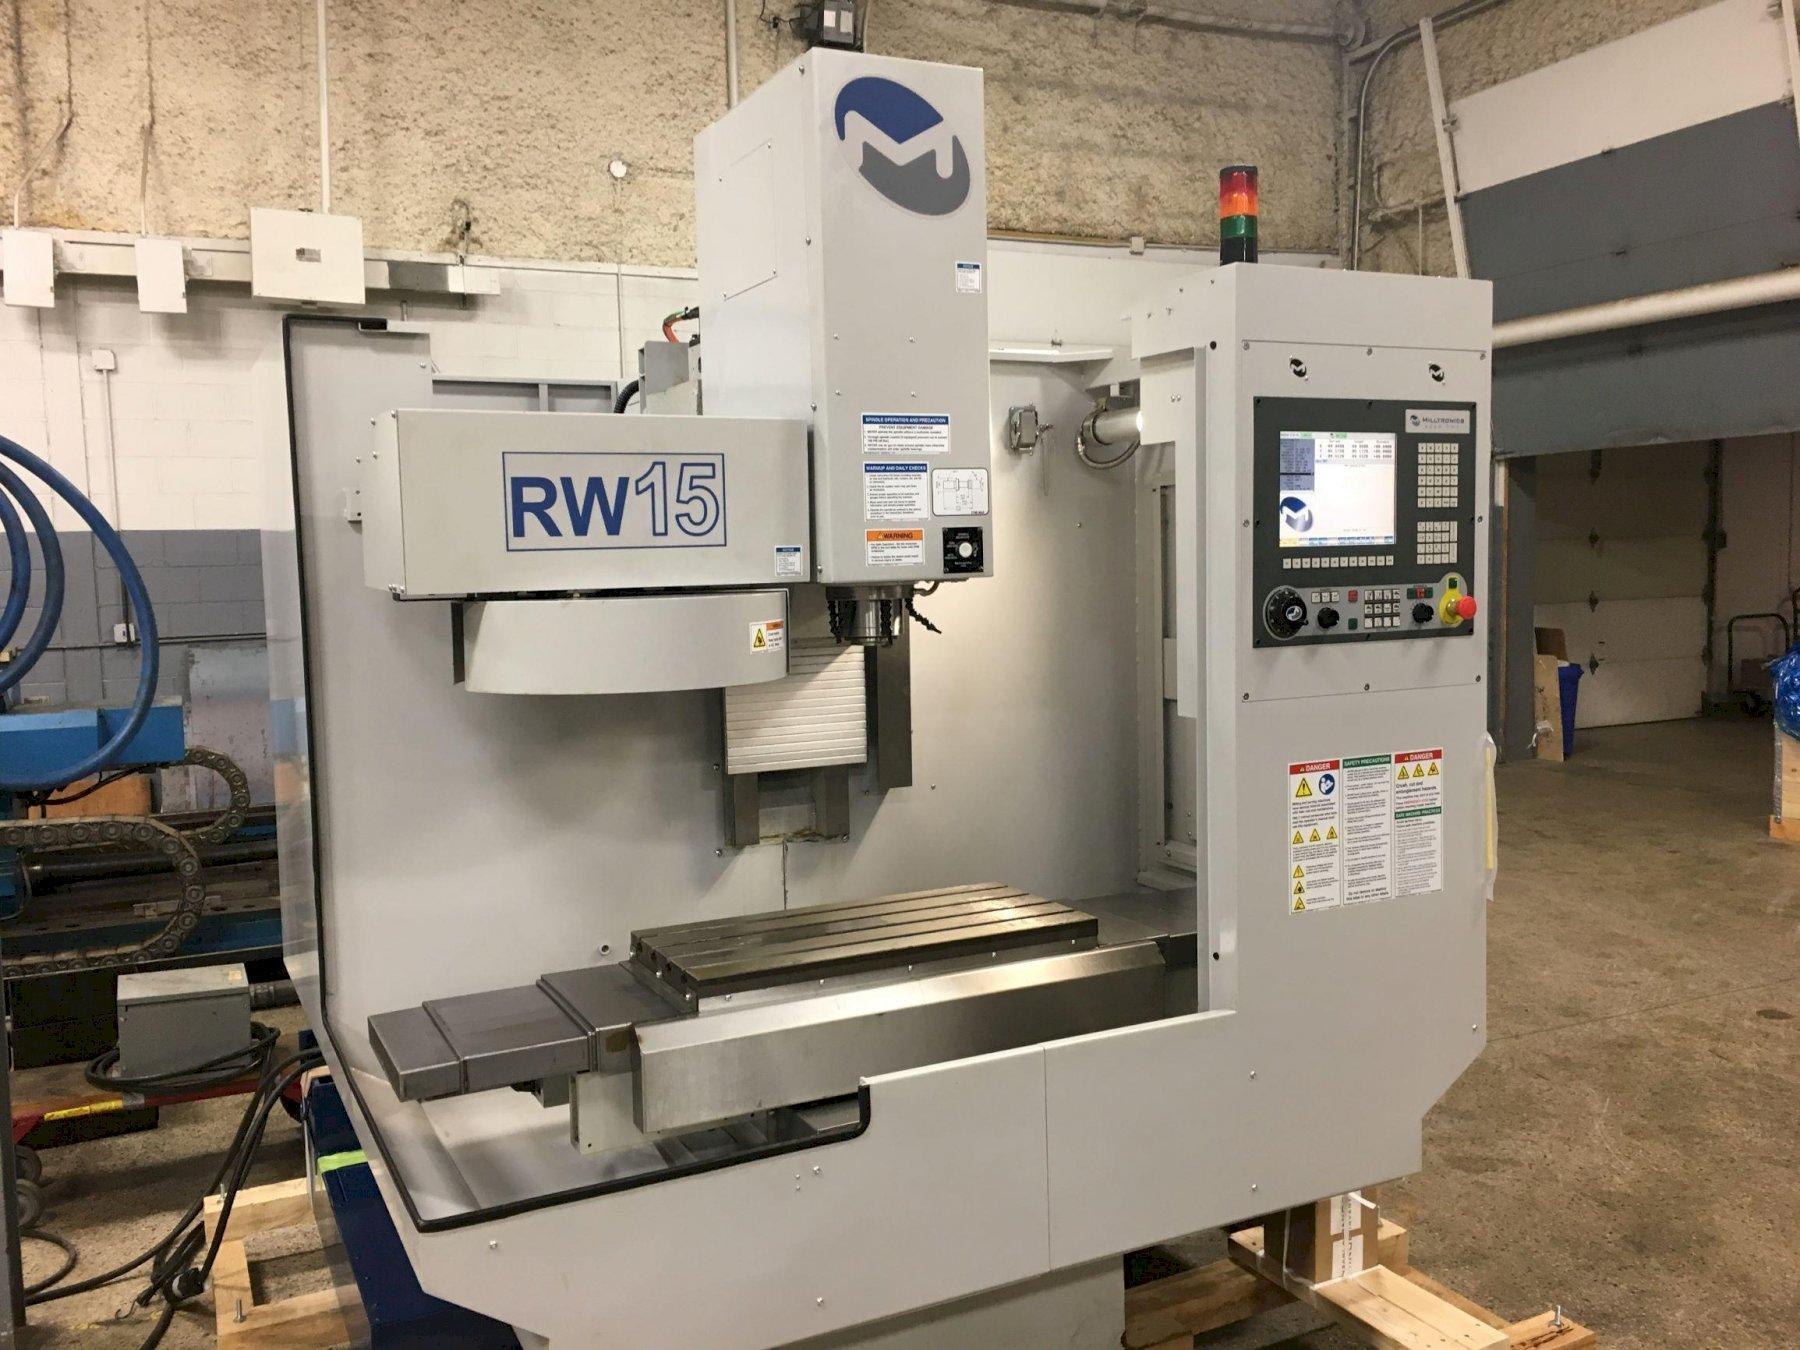 Milltronics Model RW15 CNC Vertical Machining Center, S/N 12318, New 2013.